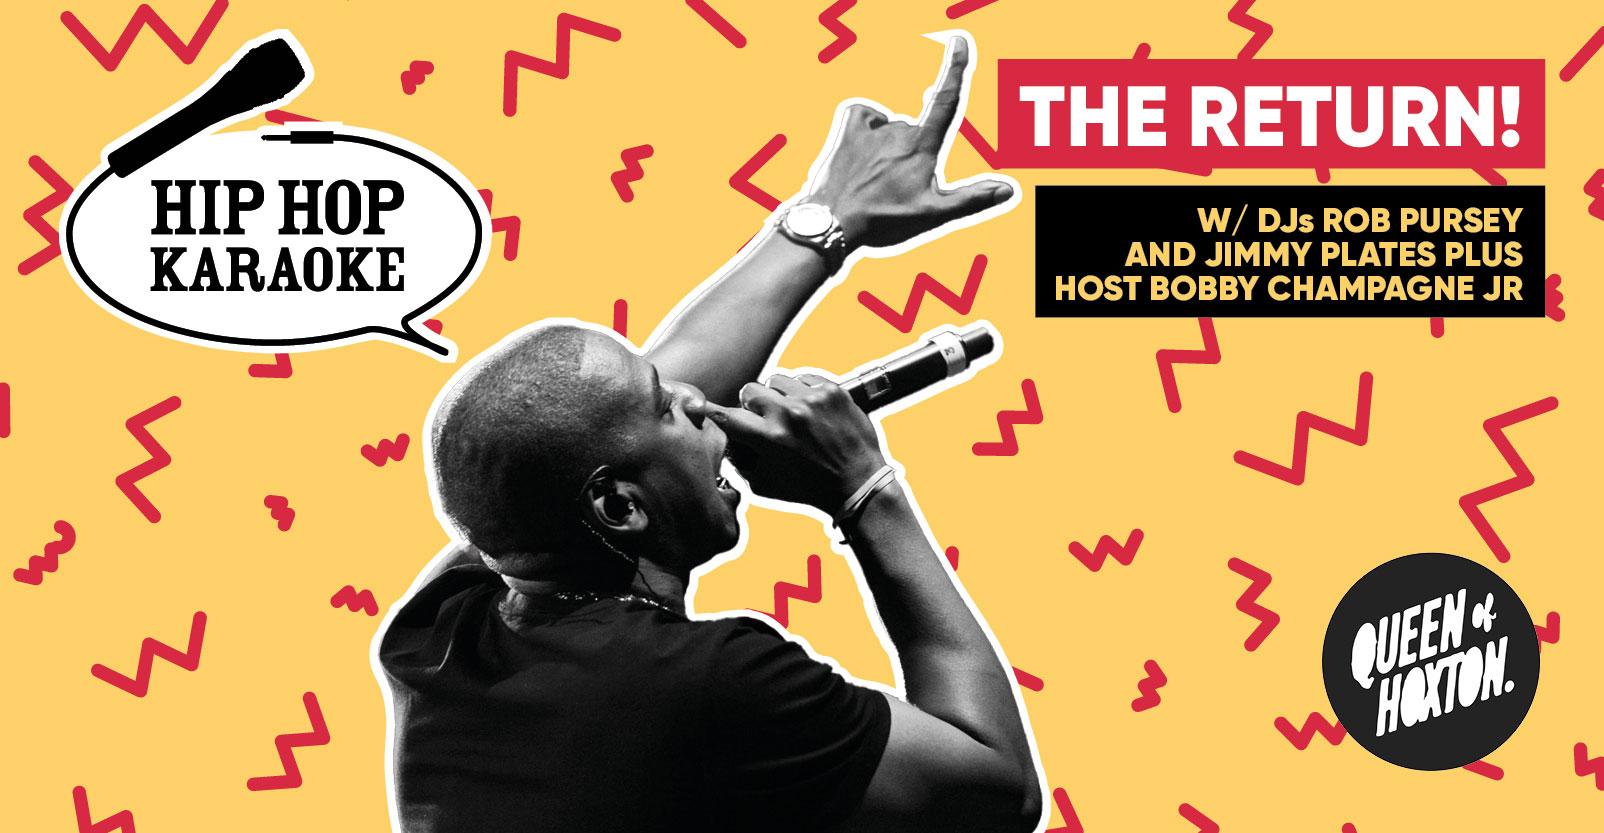 Hip Hop Karaoke!